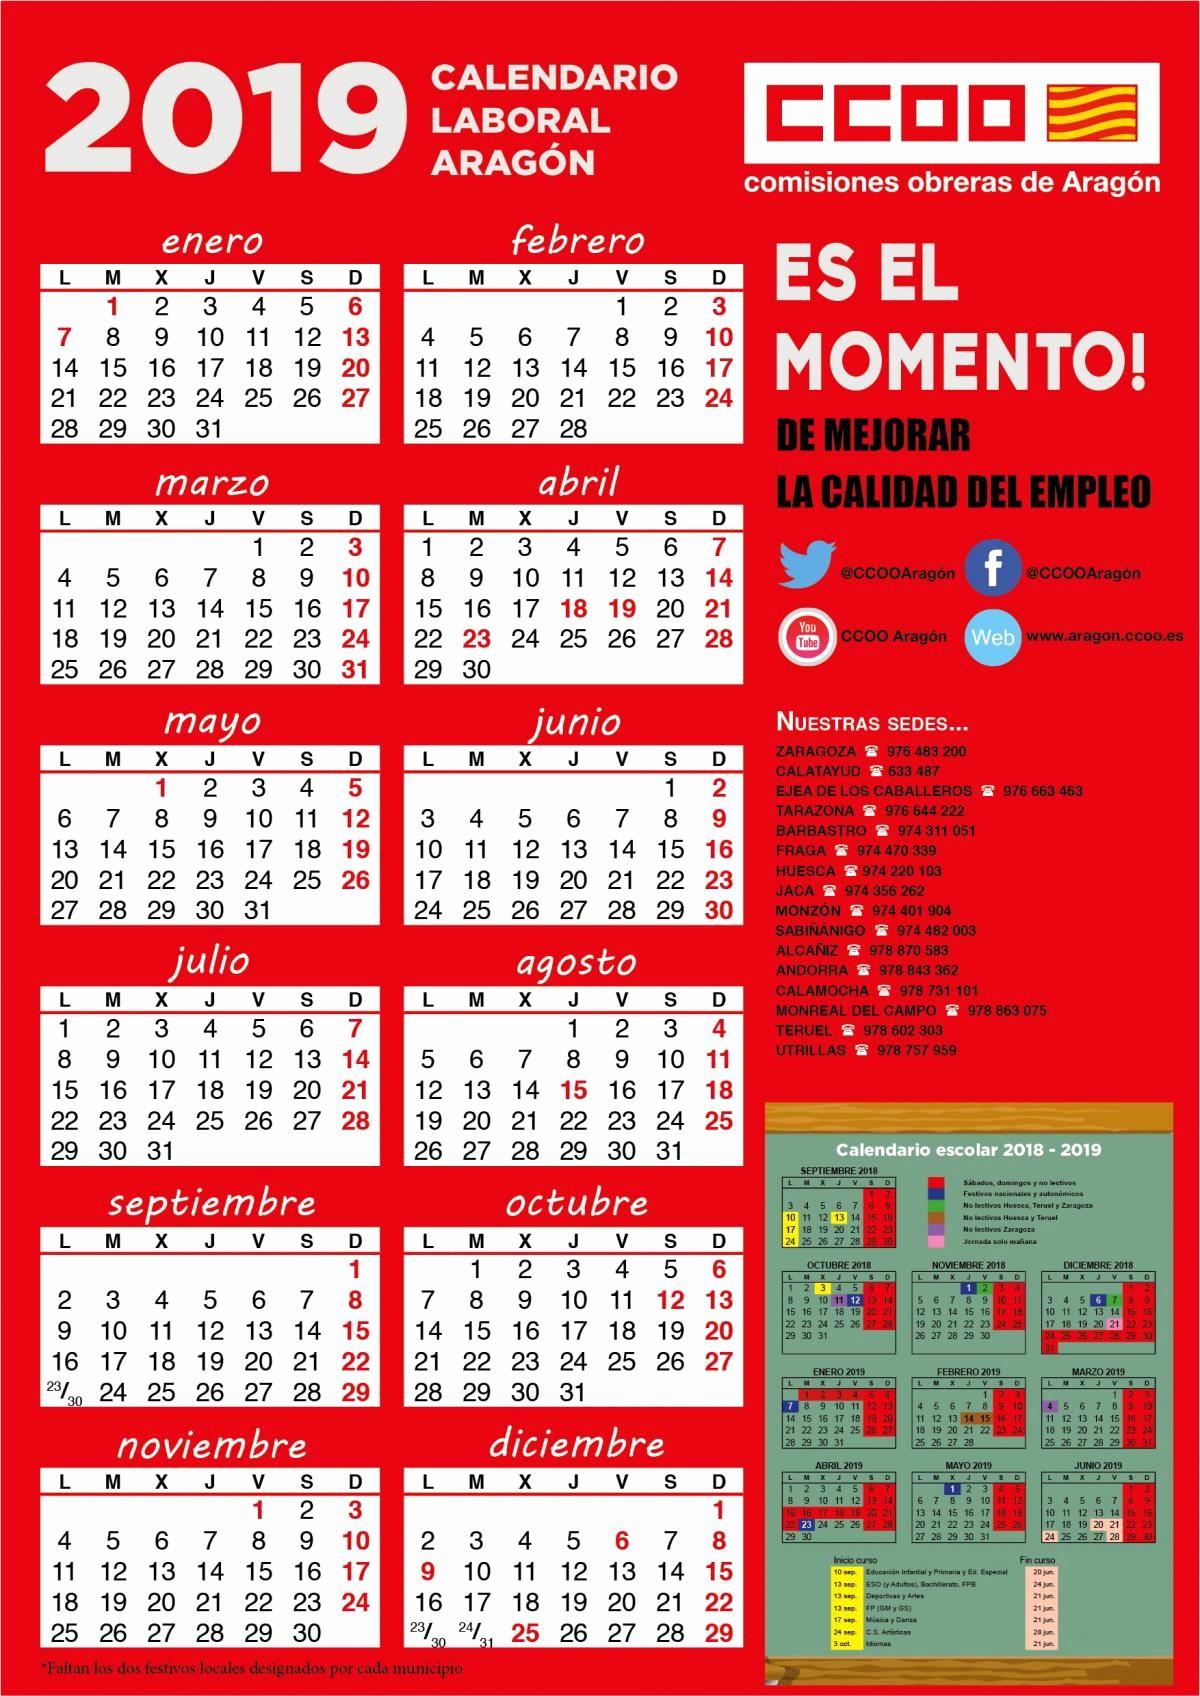 Calendario Escolar 2019 Aragon Actual Luna De Octubre Madrid 2019 Shamsdubai